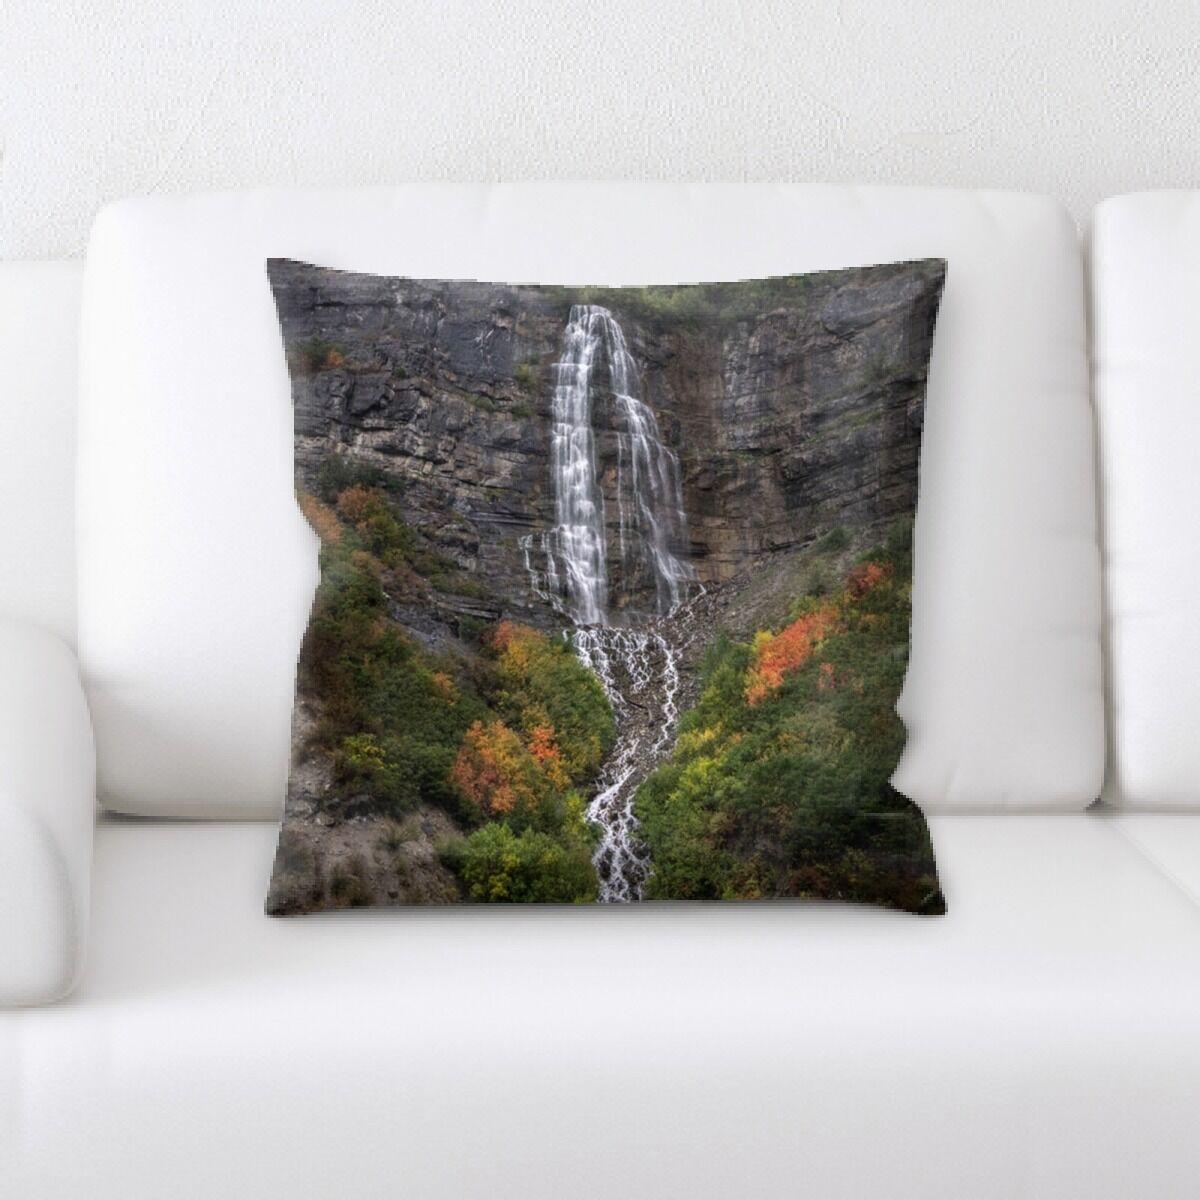 Case Mountain and Cliffs (235) Throw Pillow